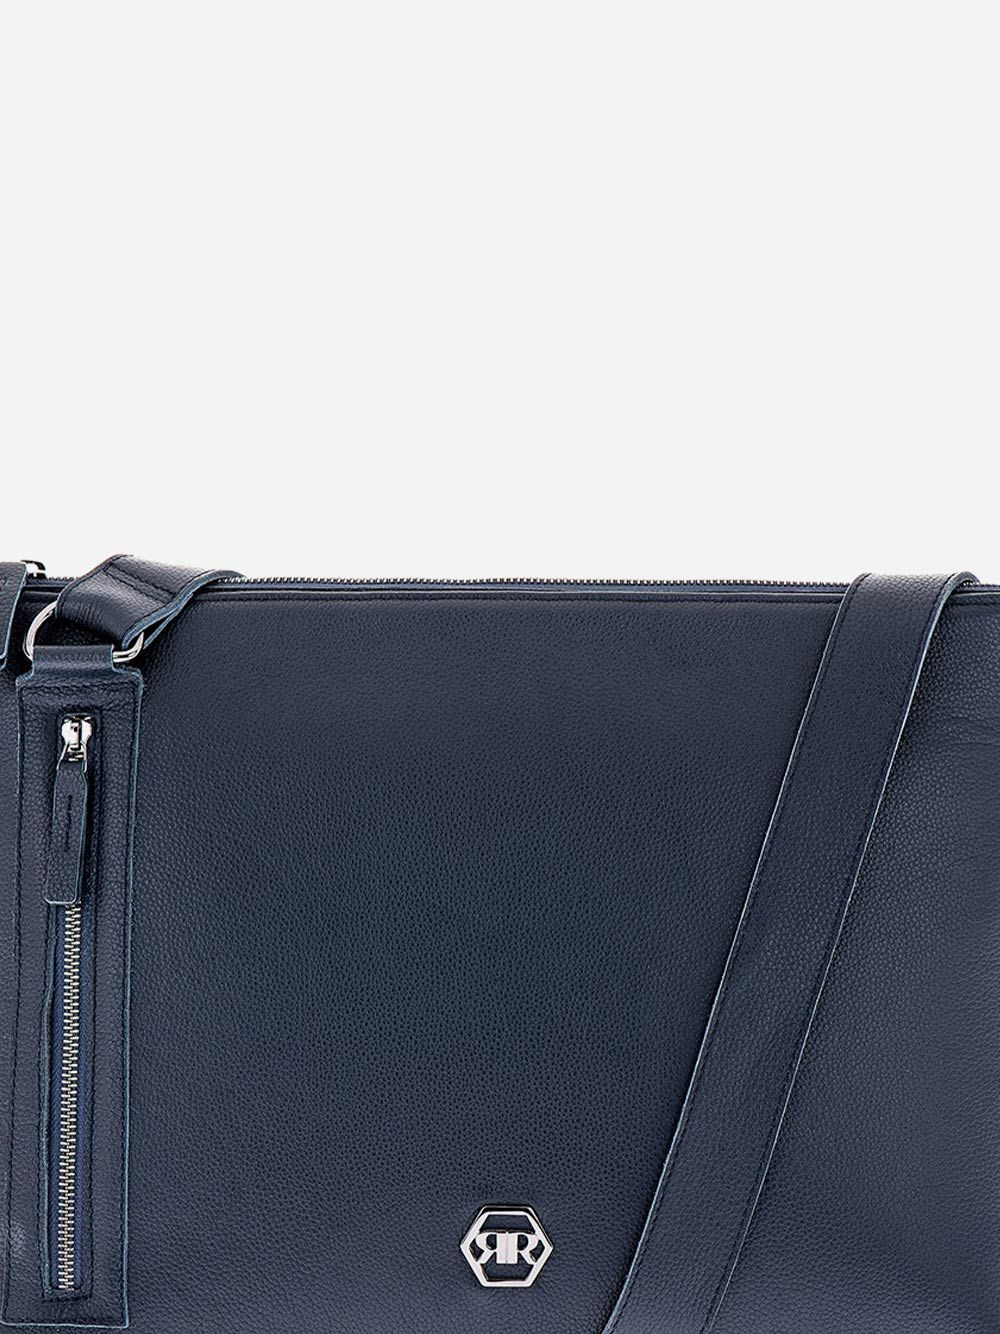 Tiracolo Azul em Pele | Rufel